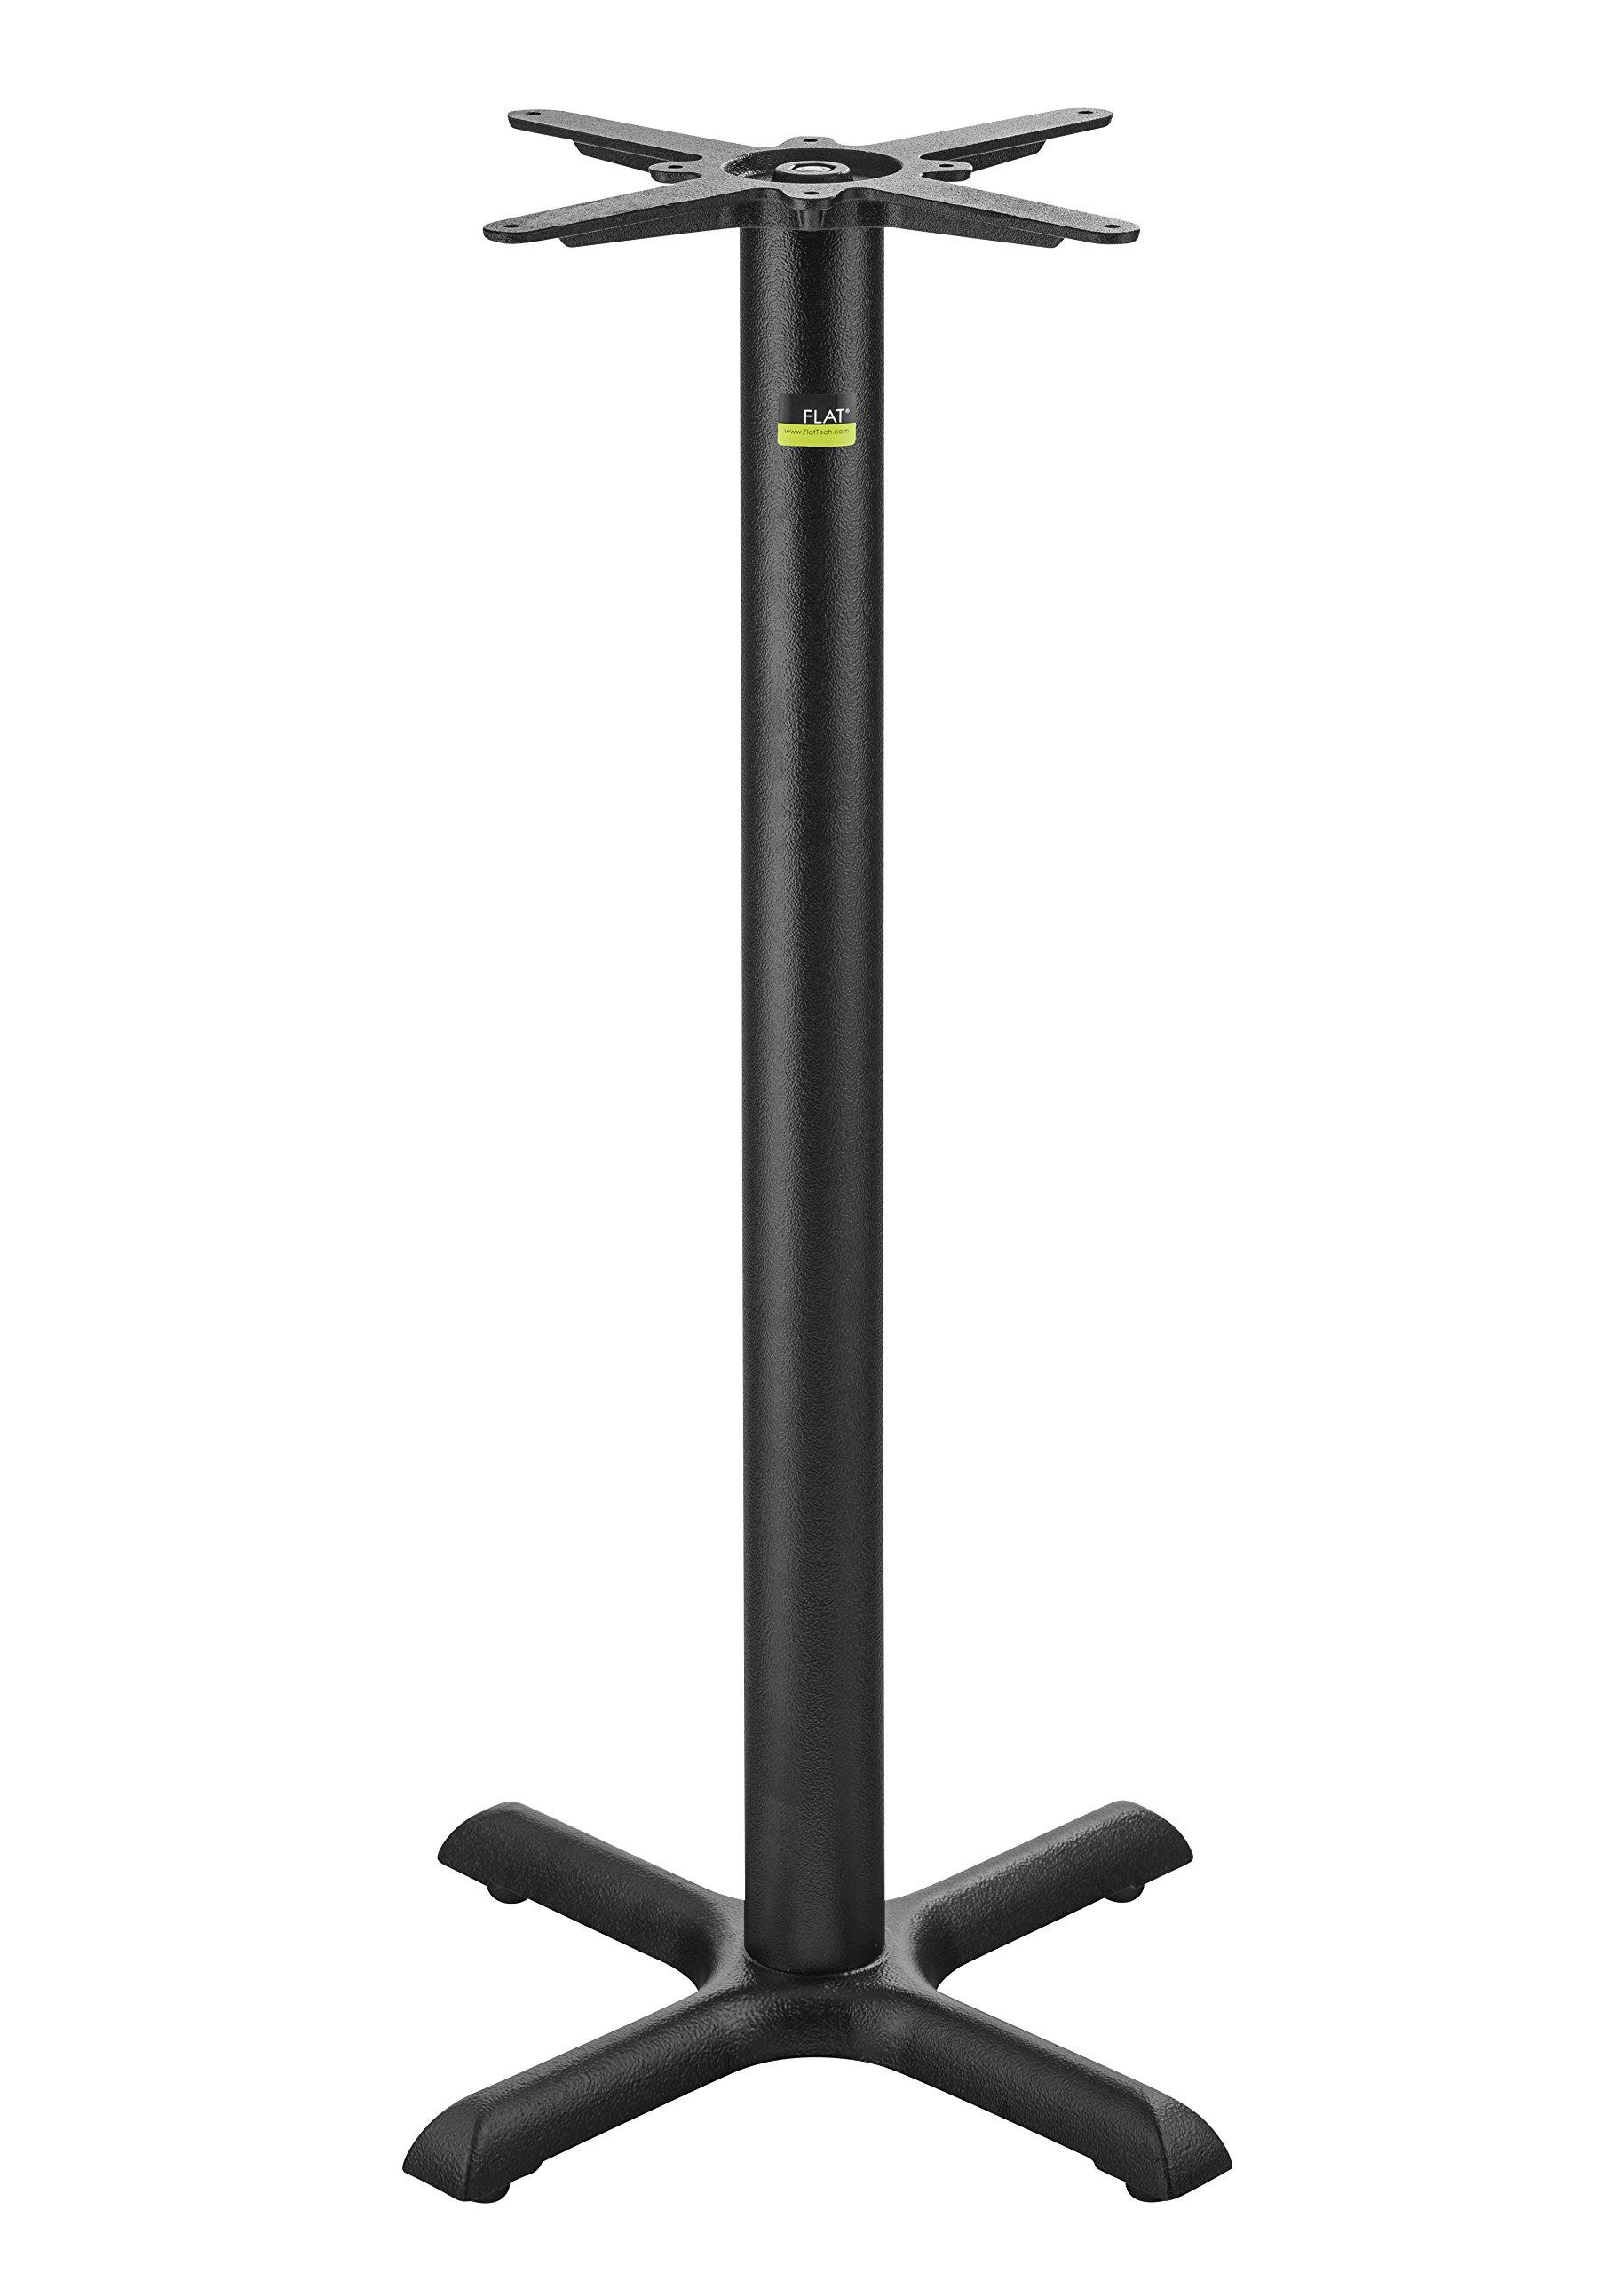 FLAT Self-Stabilizing KX22 (22'') Cast Iron, Bar Height Table Base